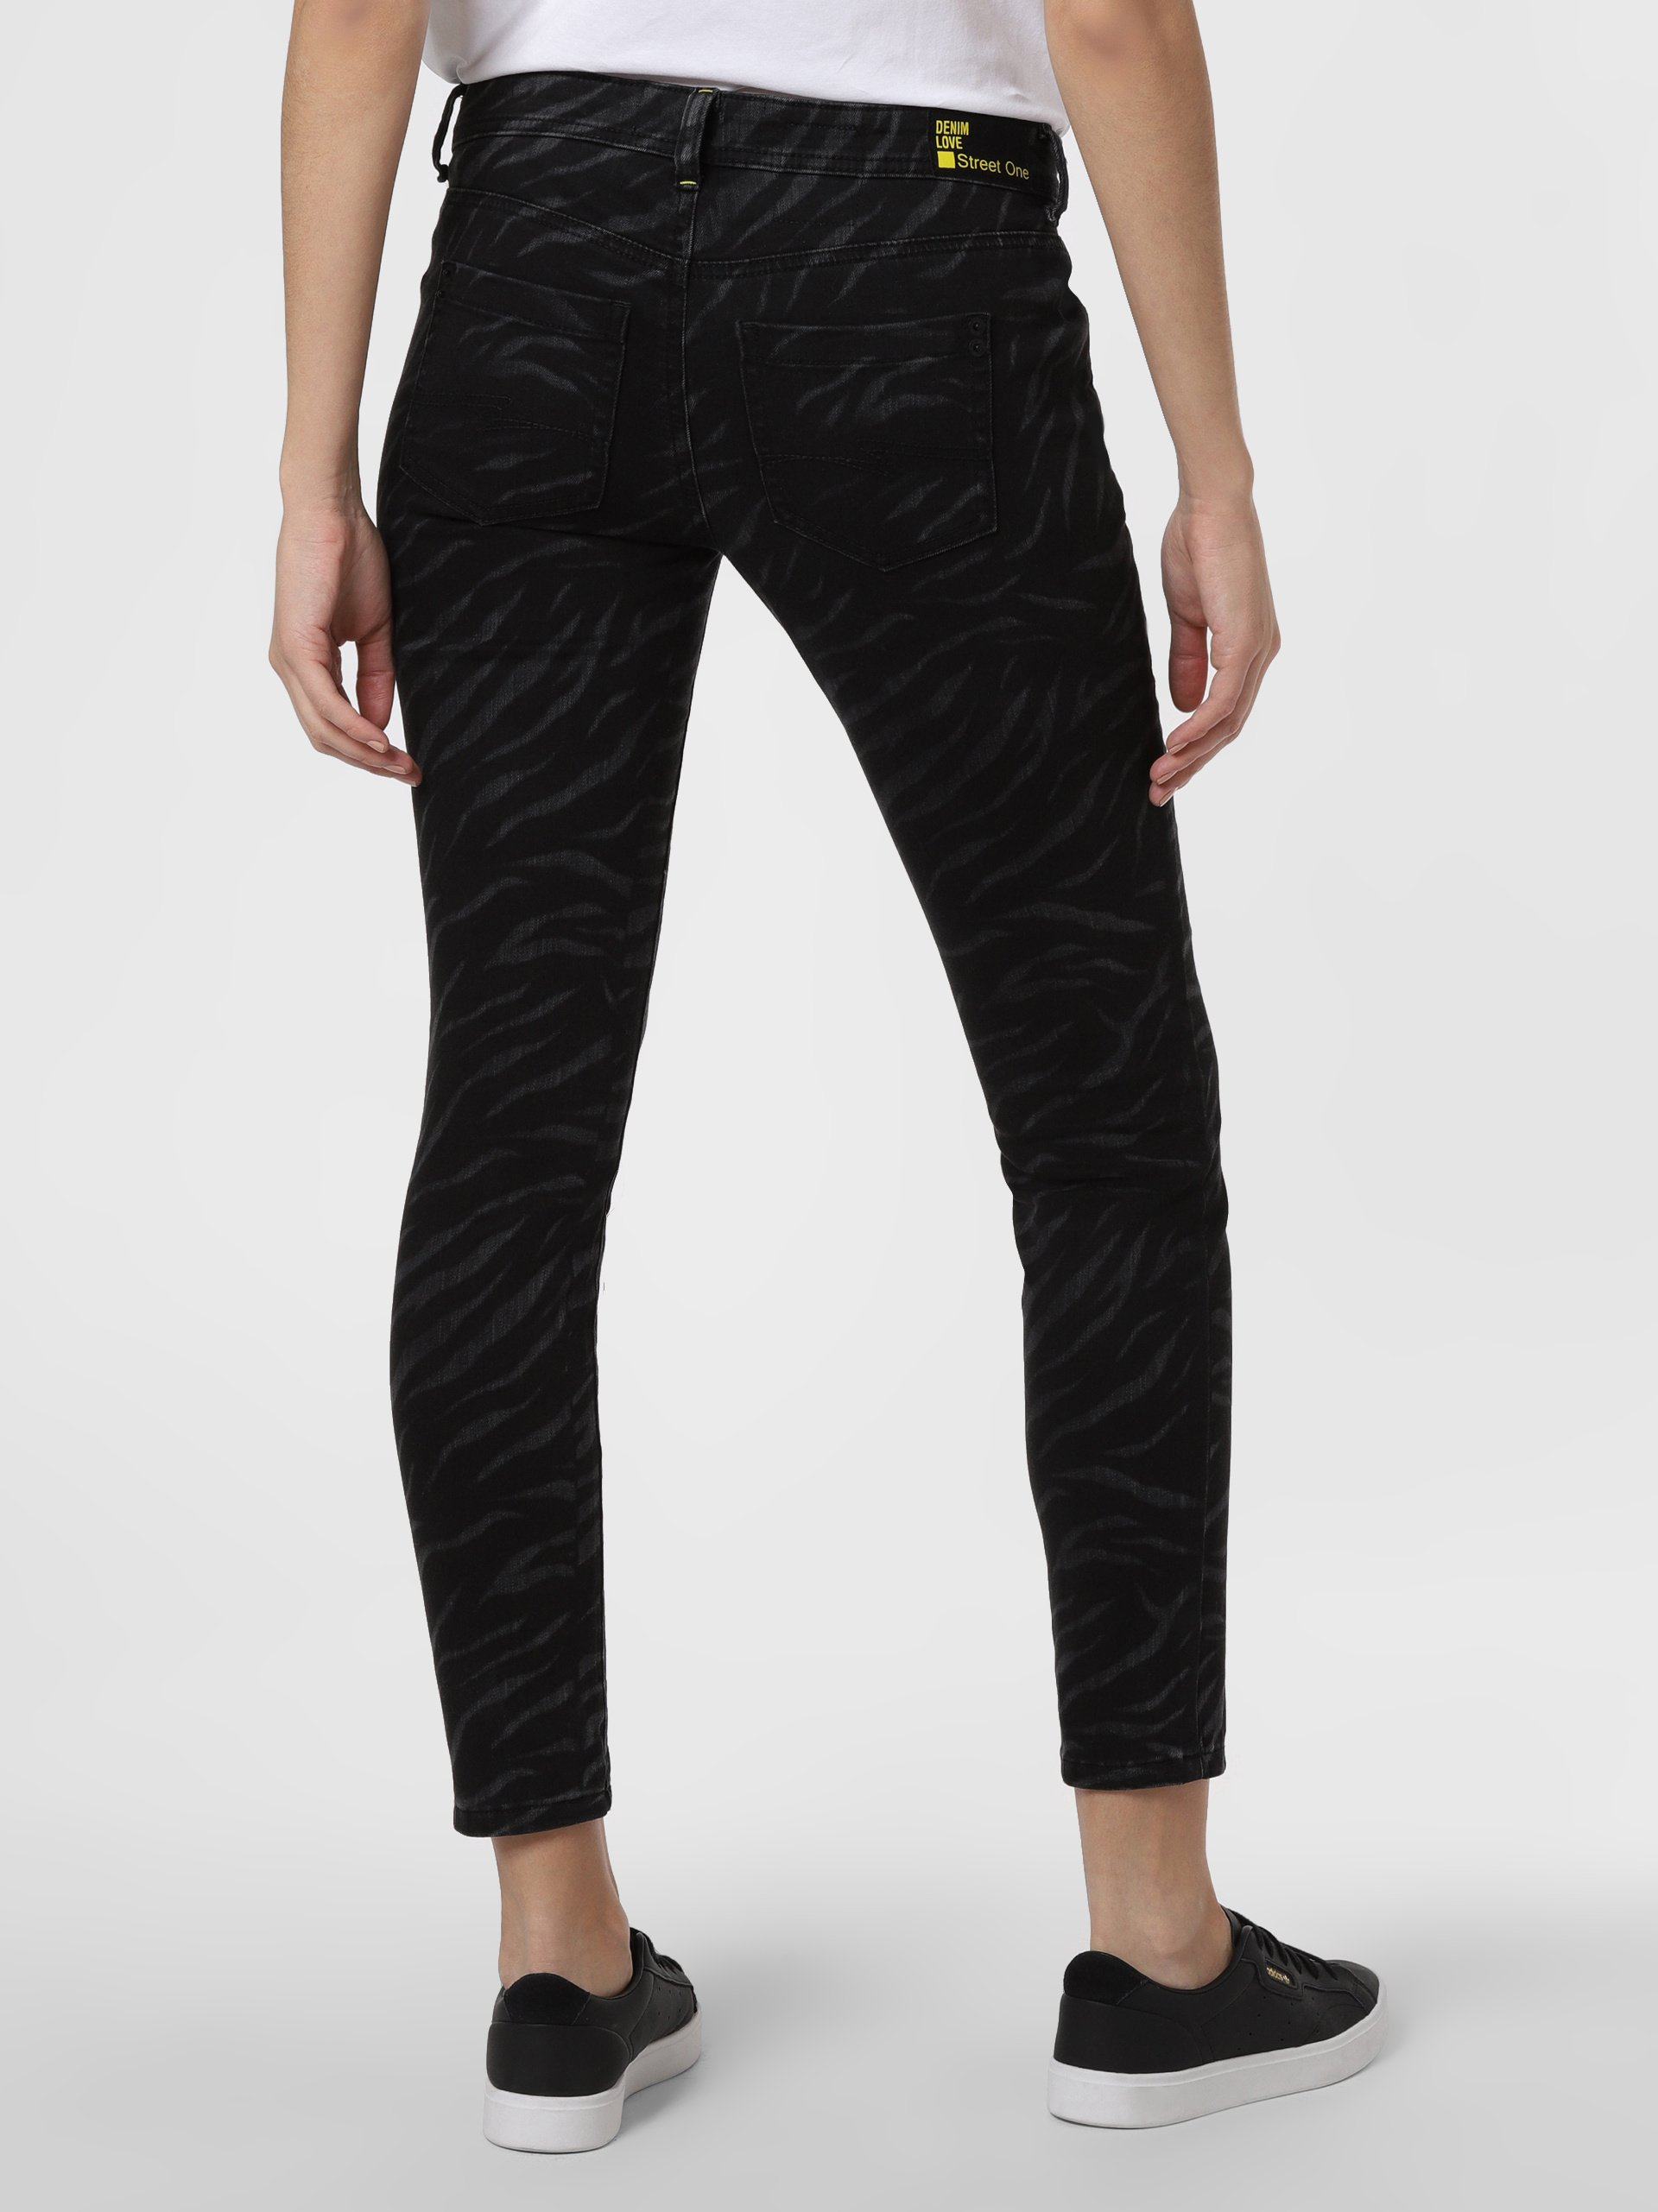 Street One Damen Jeans - York